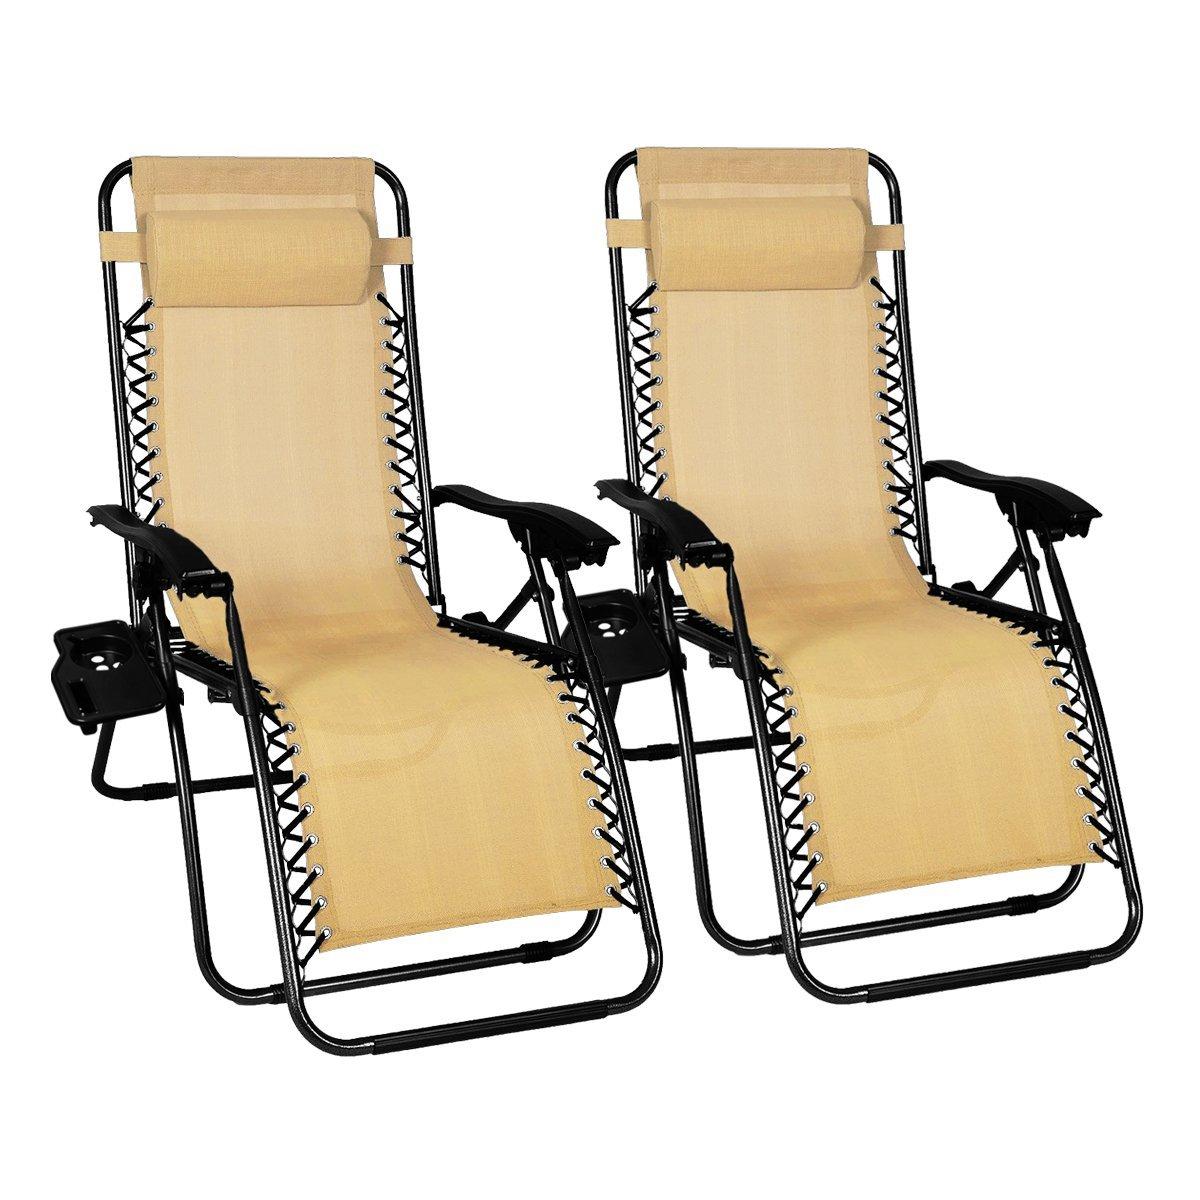 Buy Odaof Zero Gravity Chair Recliner Outdoor Patio Lounge